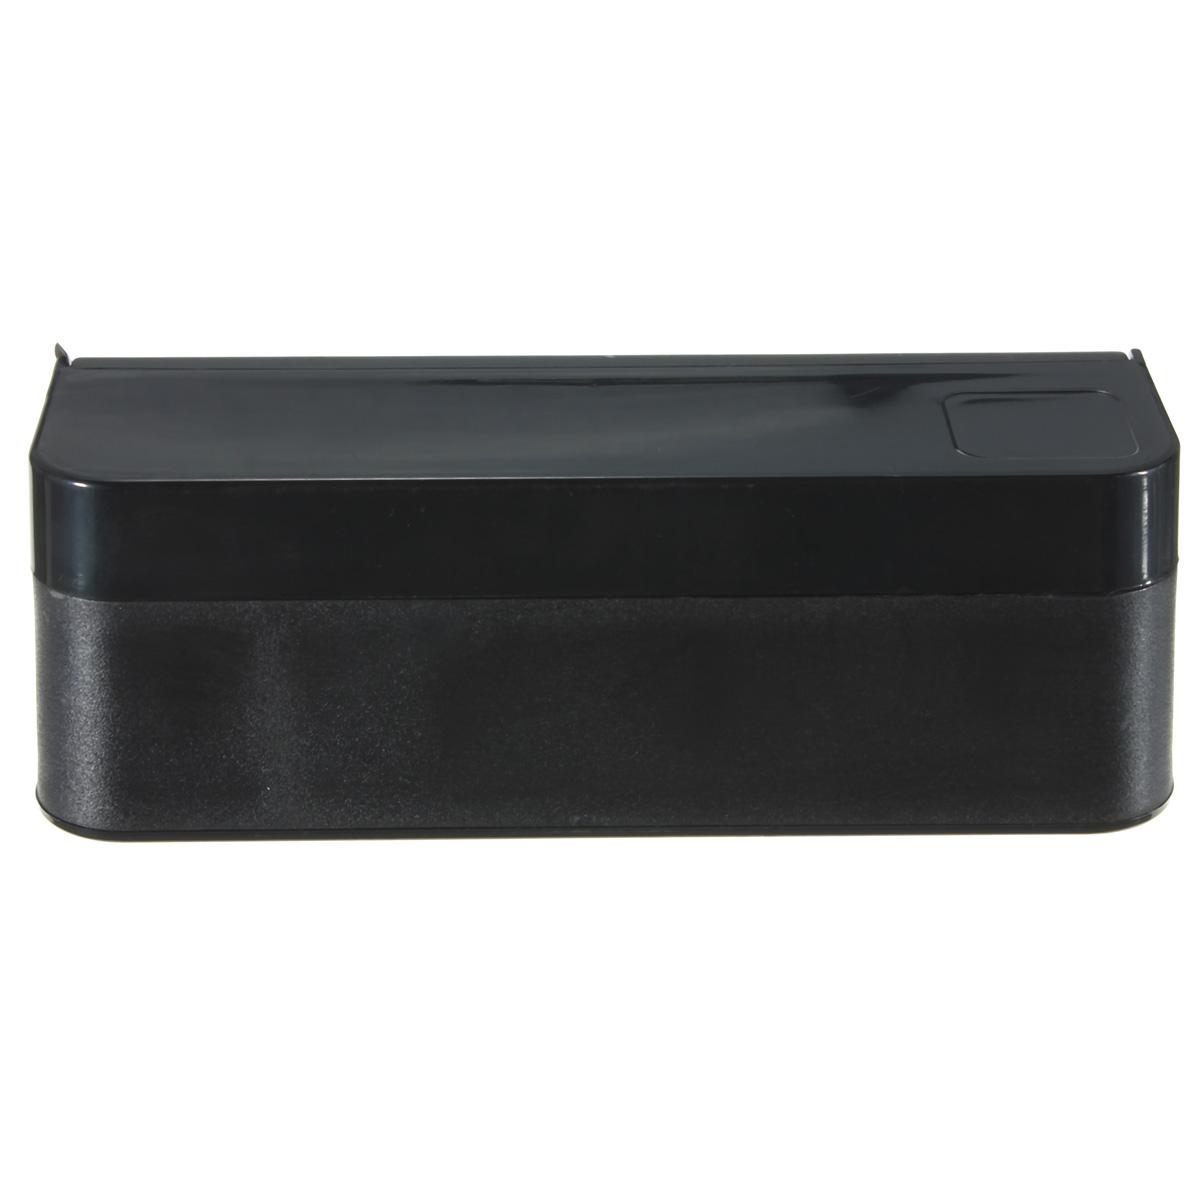 Black Car Interior Coin Case Organizer Plastic Storage Box